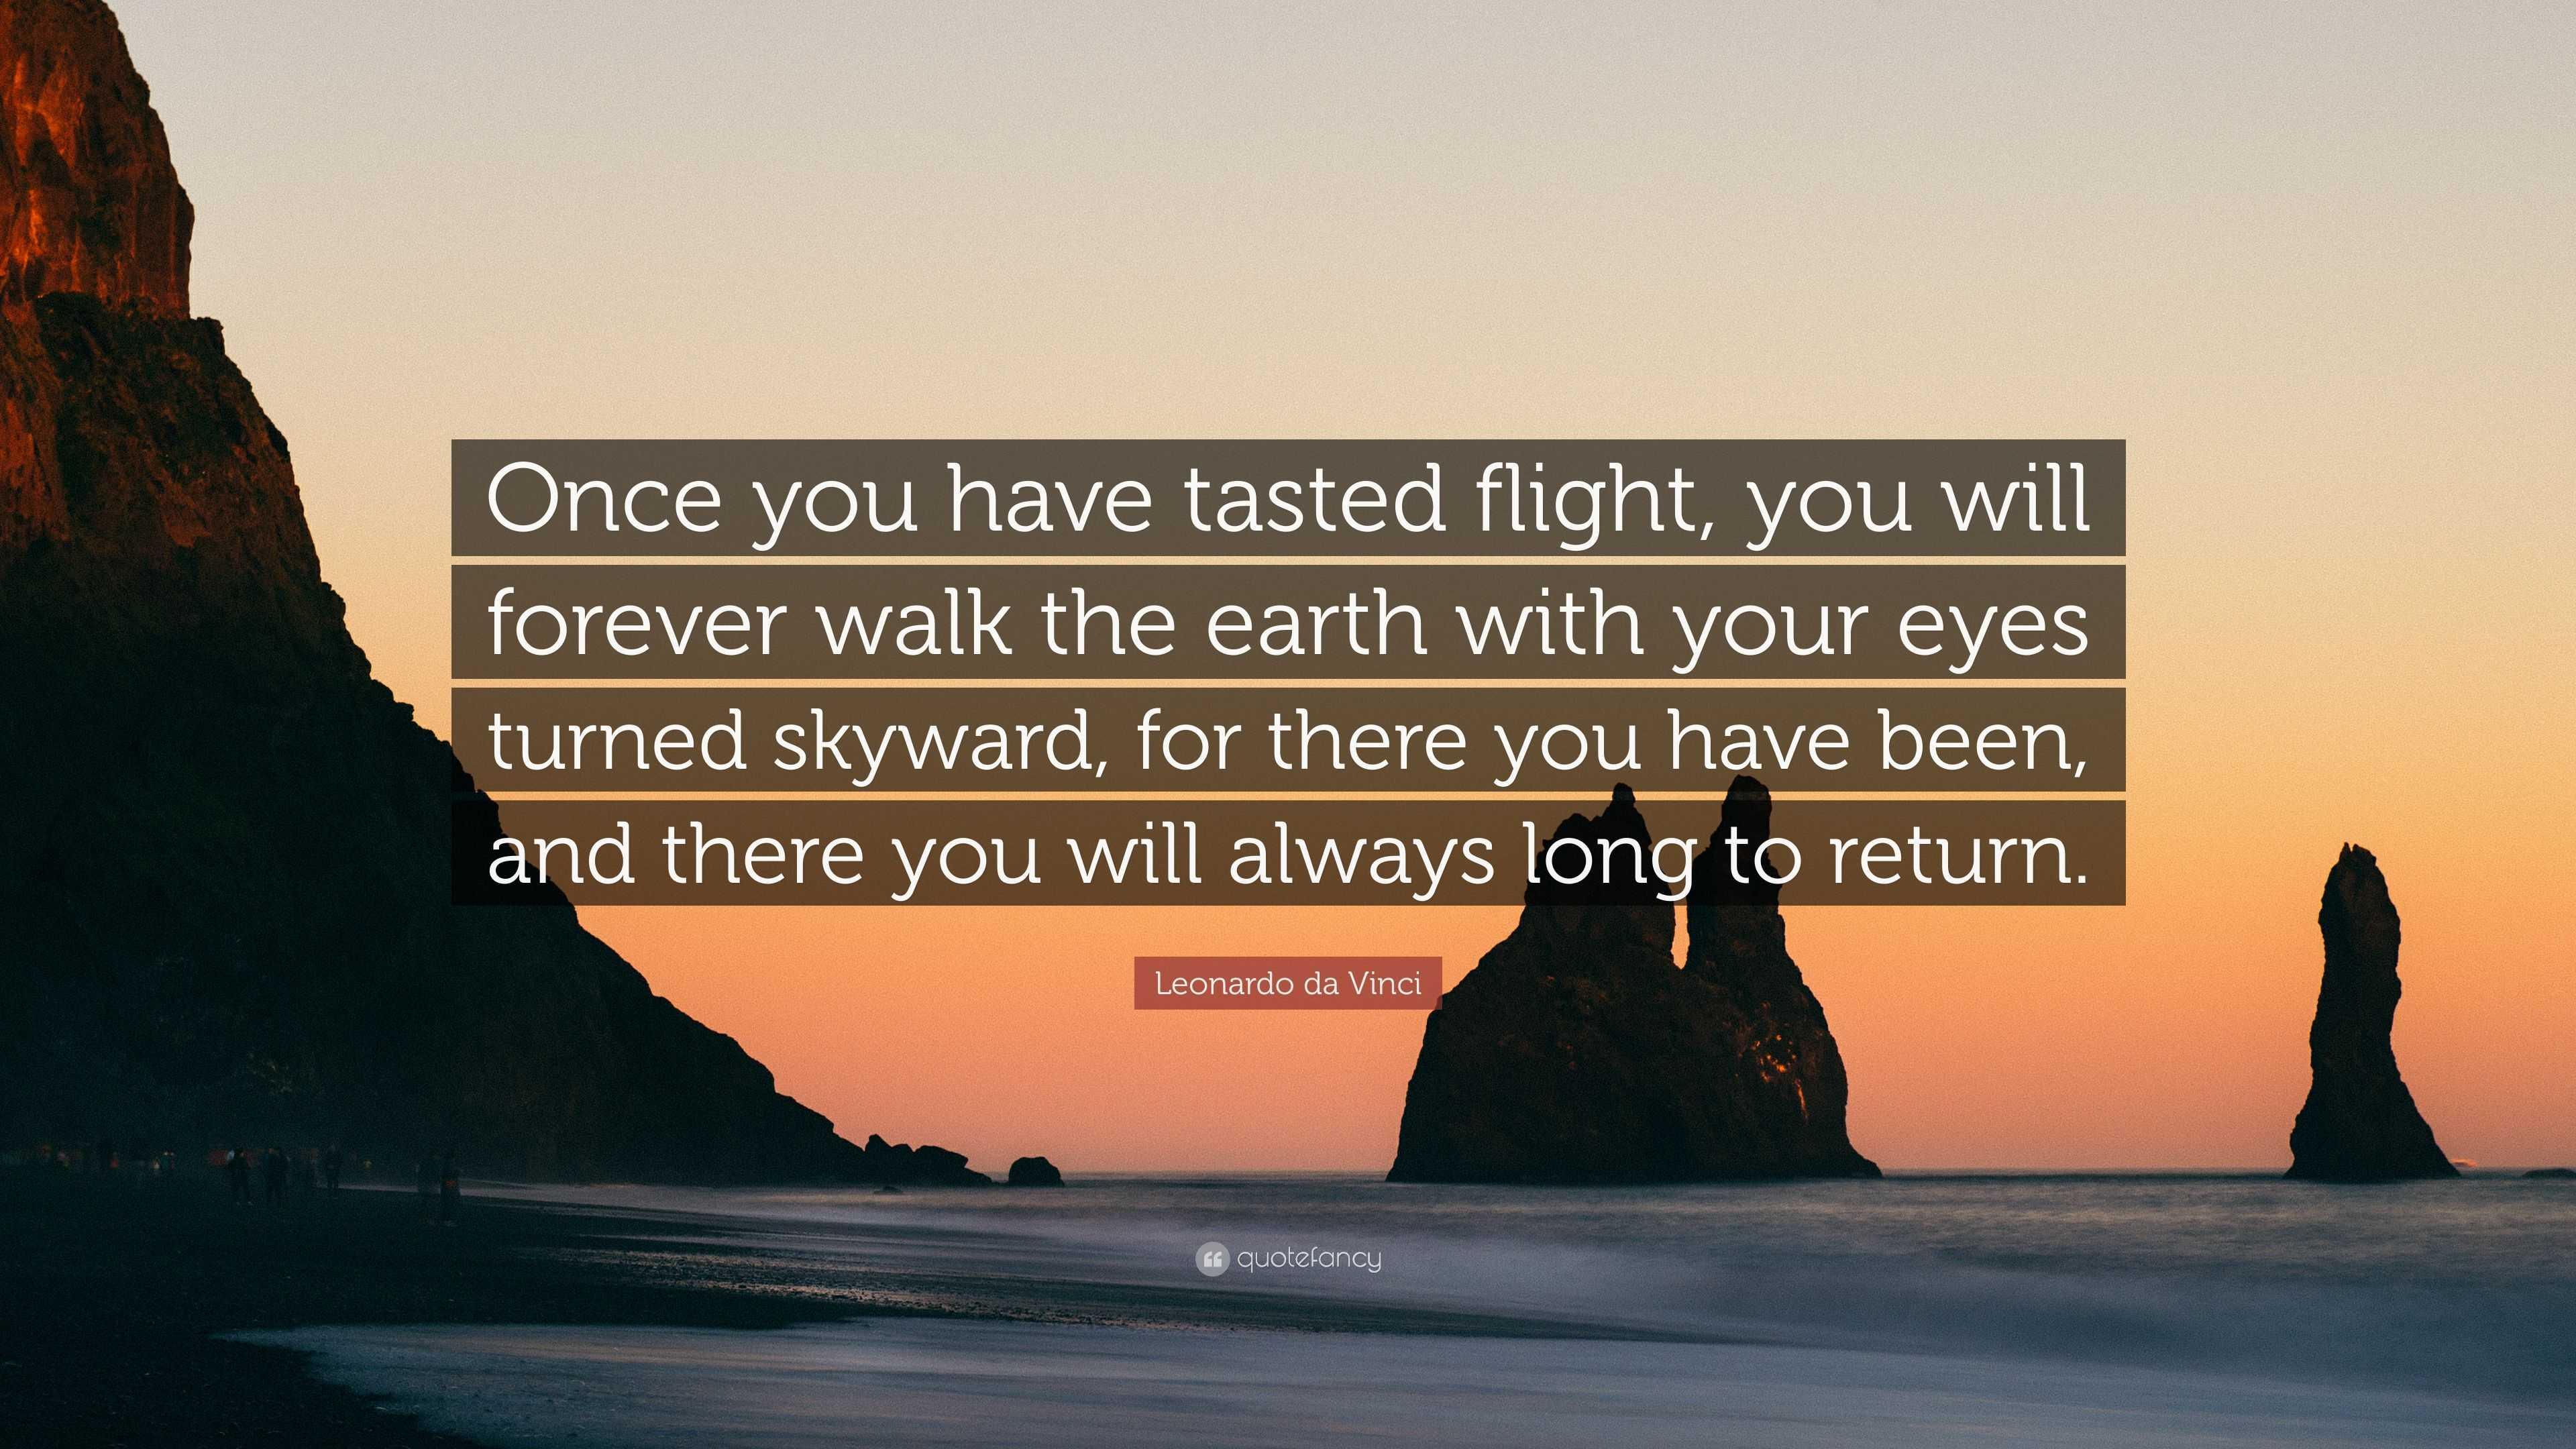 Vincent Van Gogh Quotes Wallpaper Leonardo Da Vinci Quote Once You Have Tasted Flight You